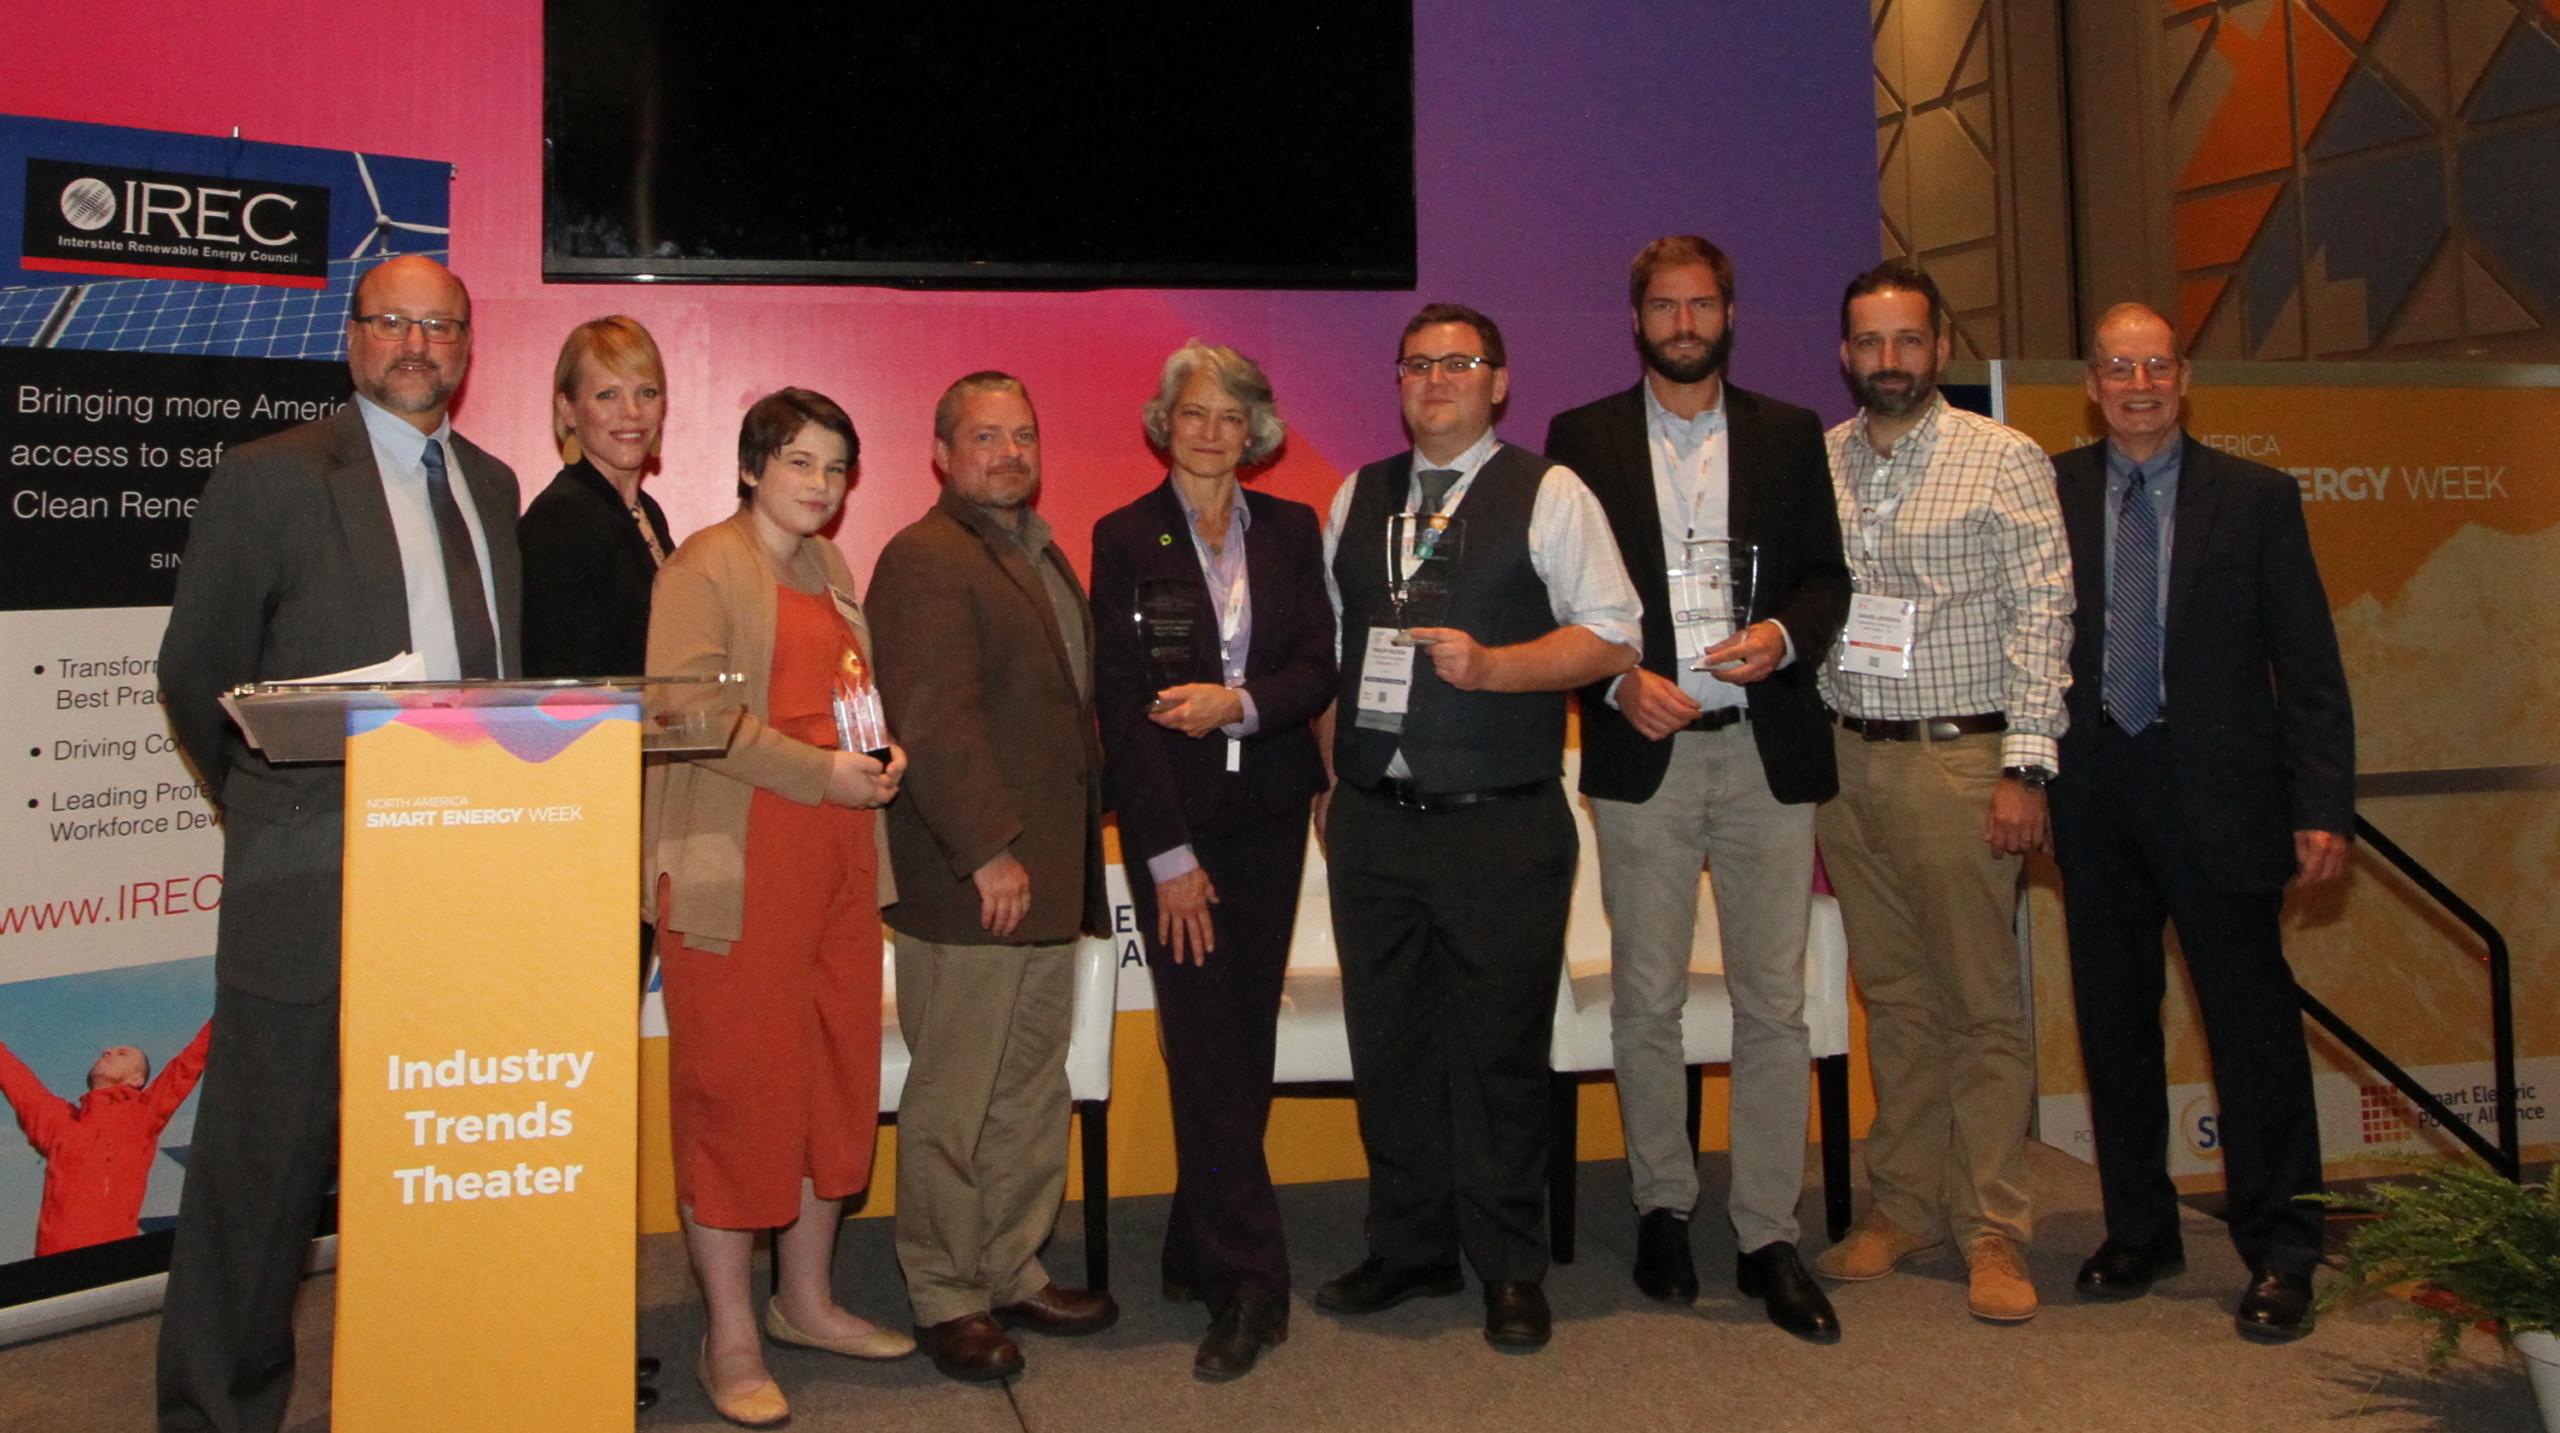 IREC 2019 3iAwardees & Energy Heroes